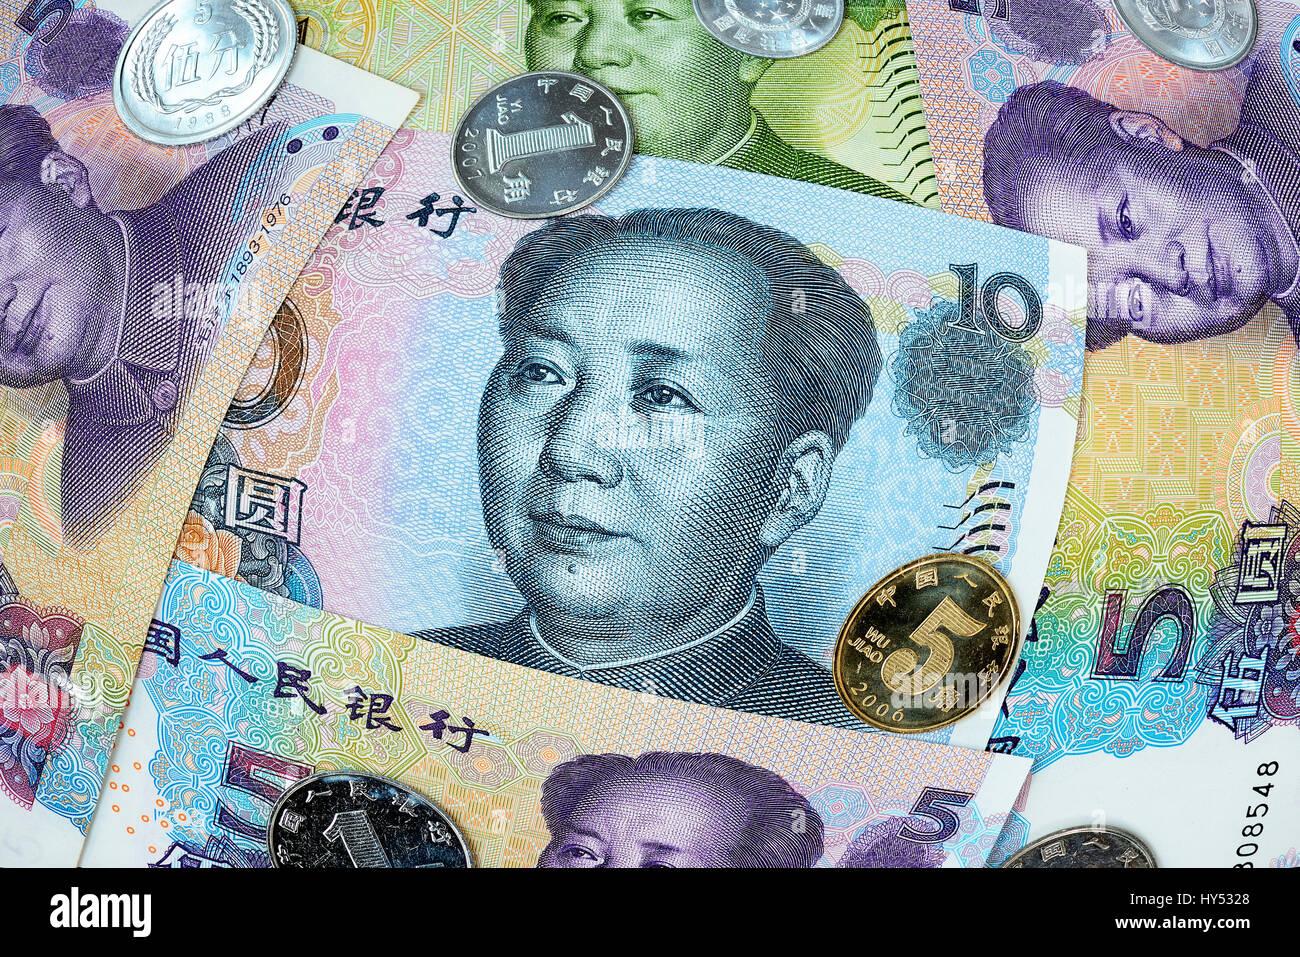 Geldmuenzen Photos Geldmuenzen Images Alamy